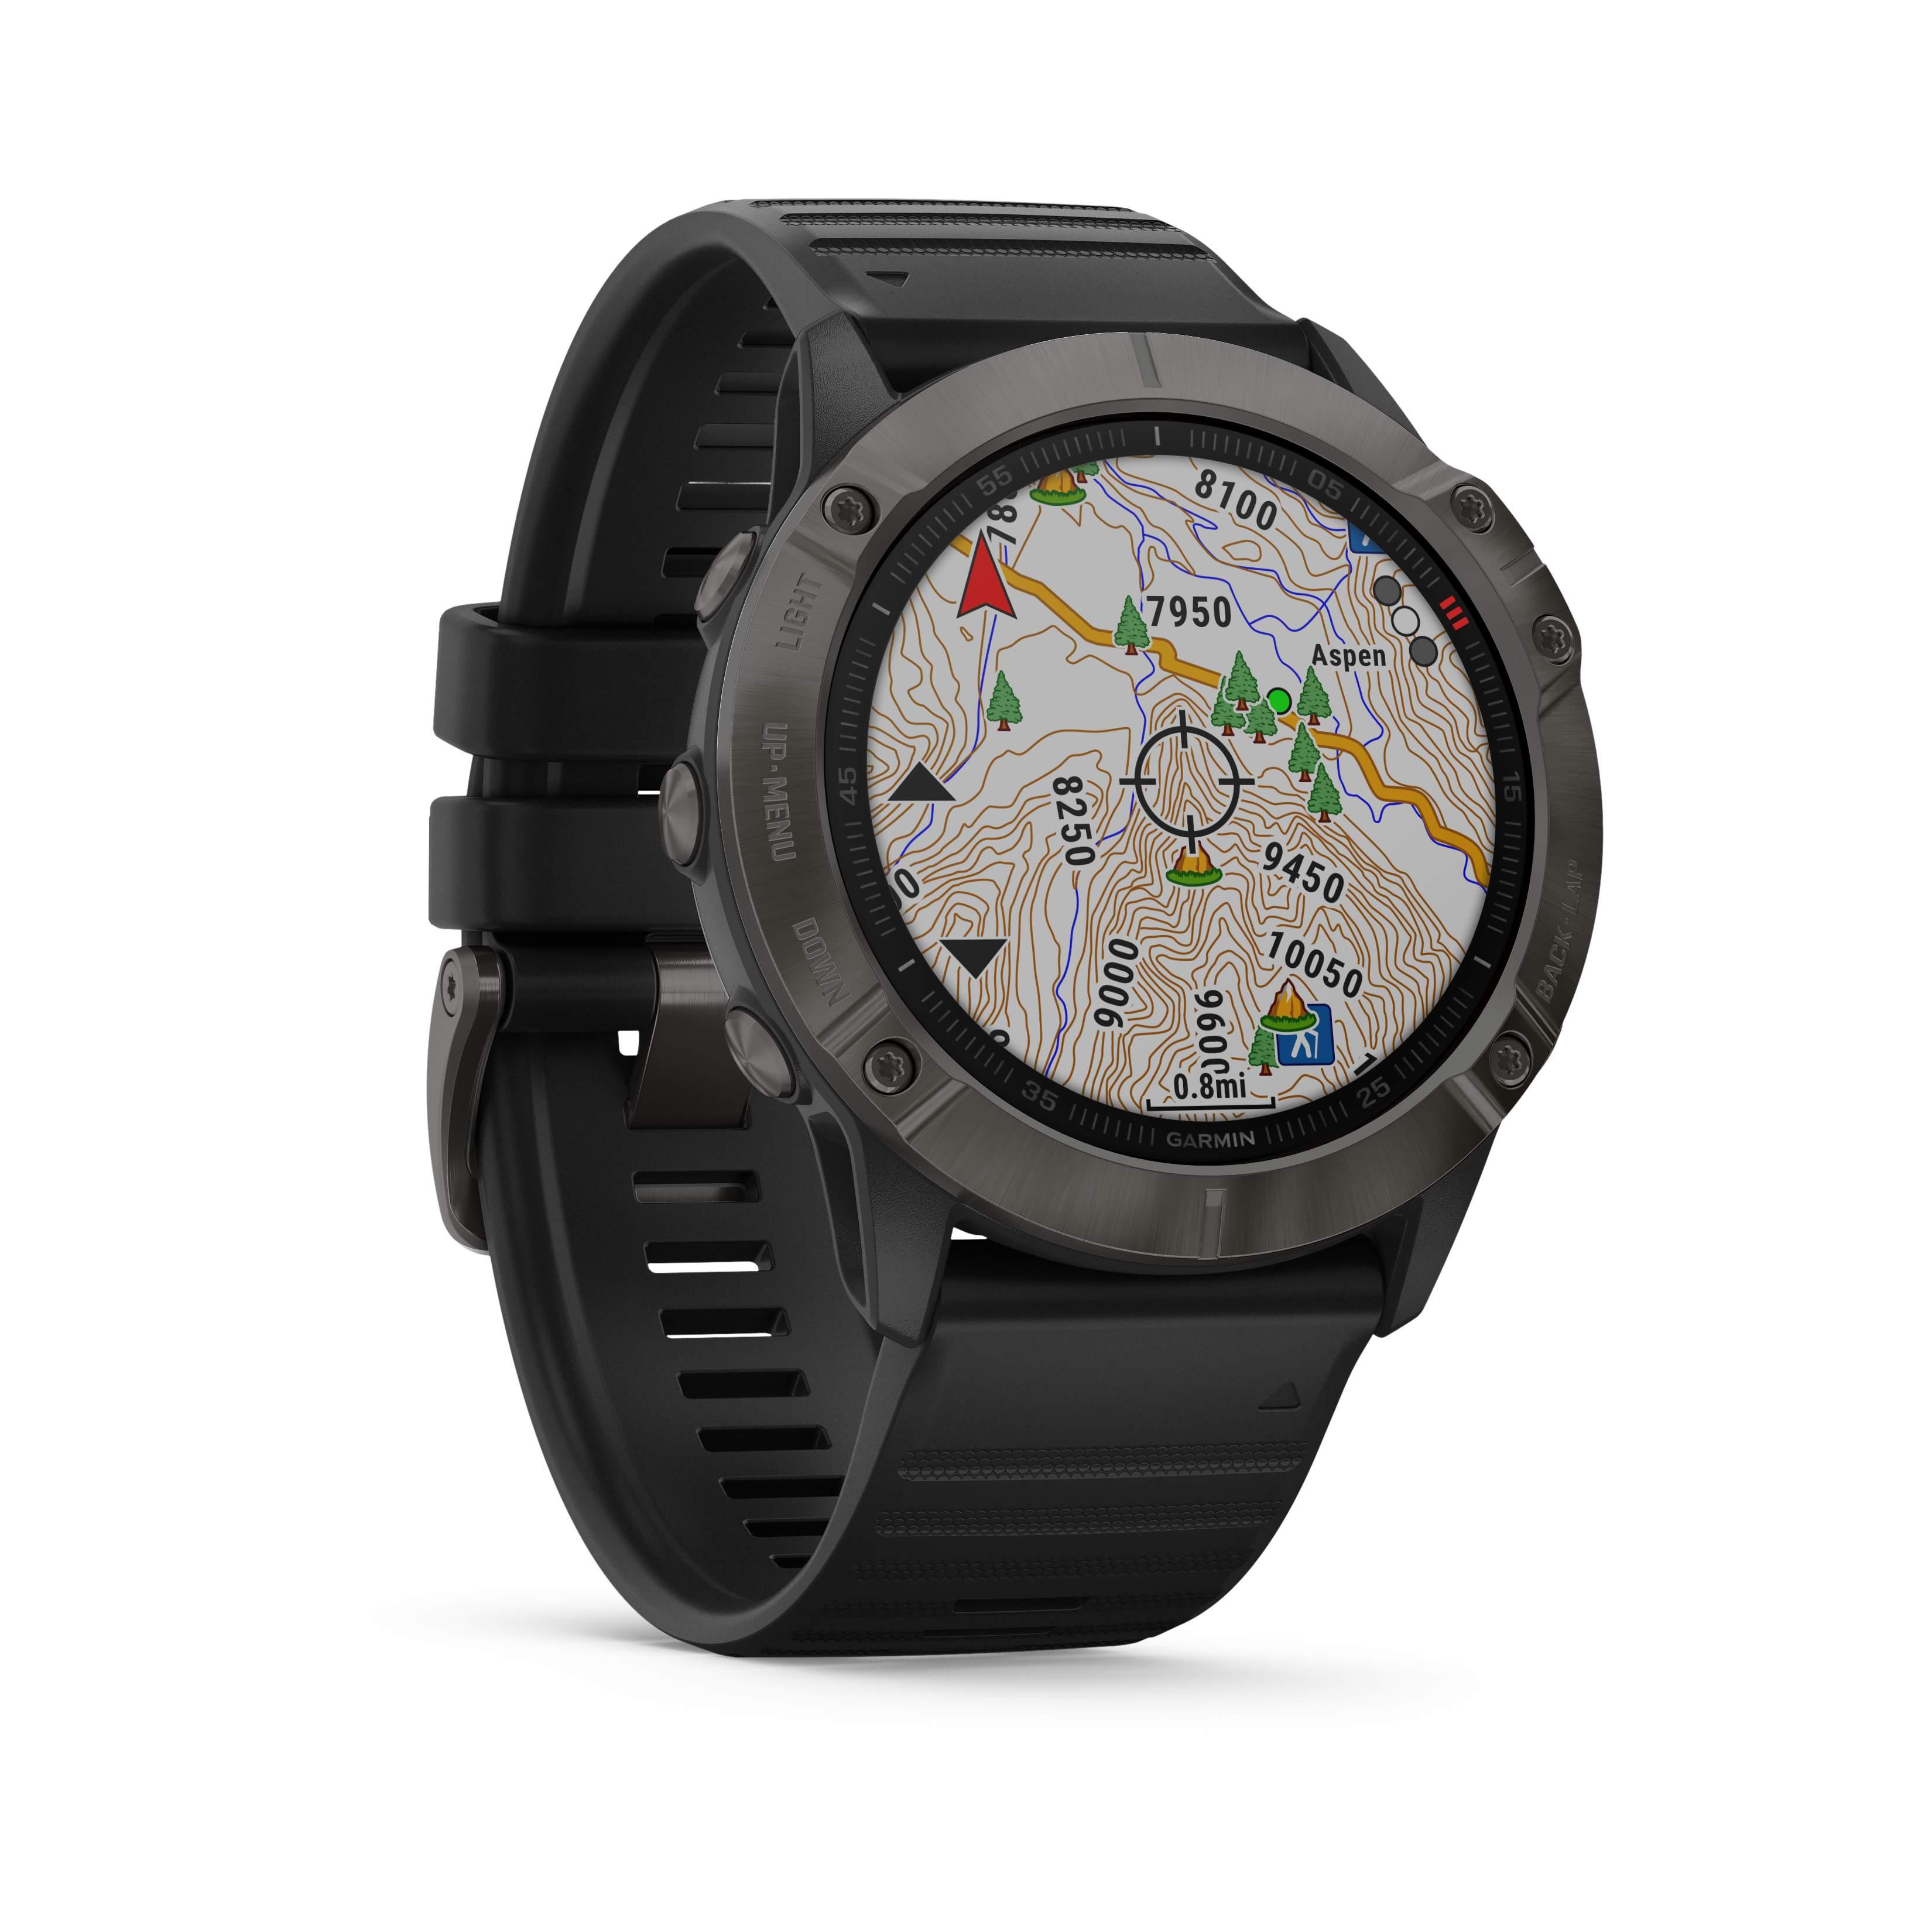 Garmin fēnix® 6X SAPPHIRE Schwarz/Schiefergrau DLC Saphirglas mit QUICKFIT-Silikon-Armband 26mm Schwarz